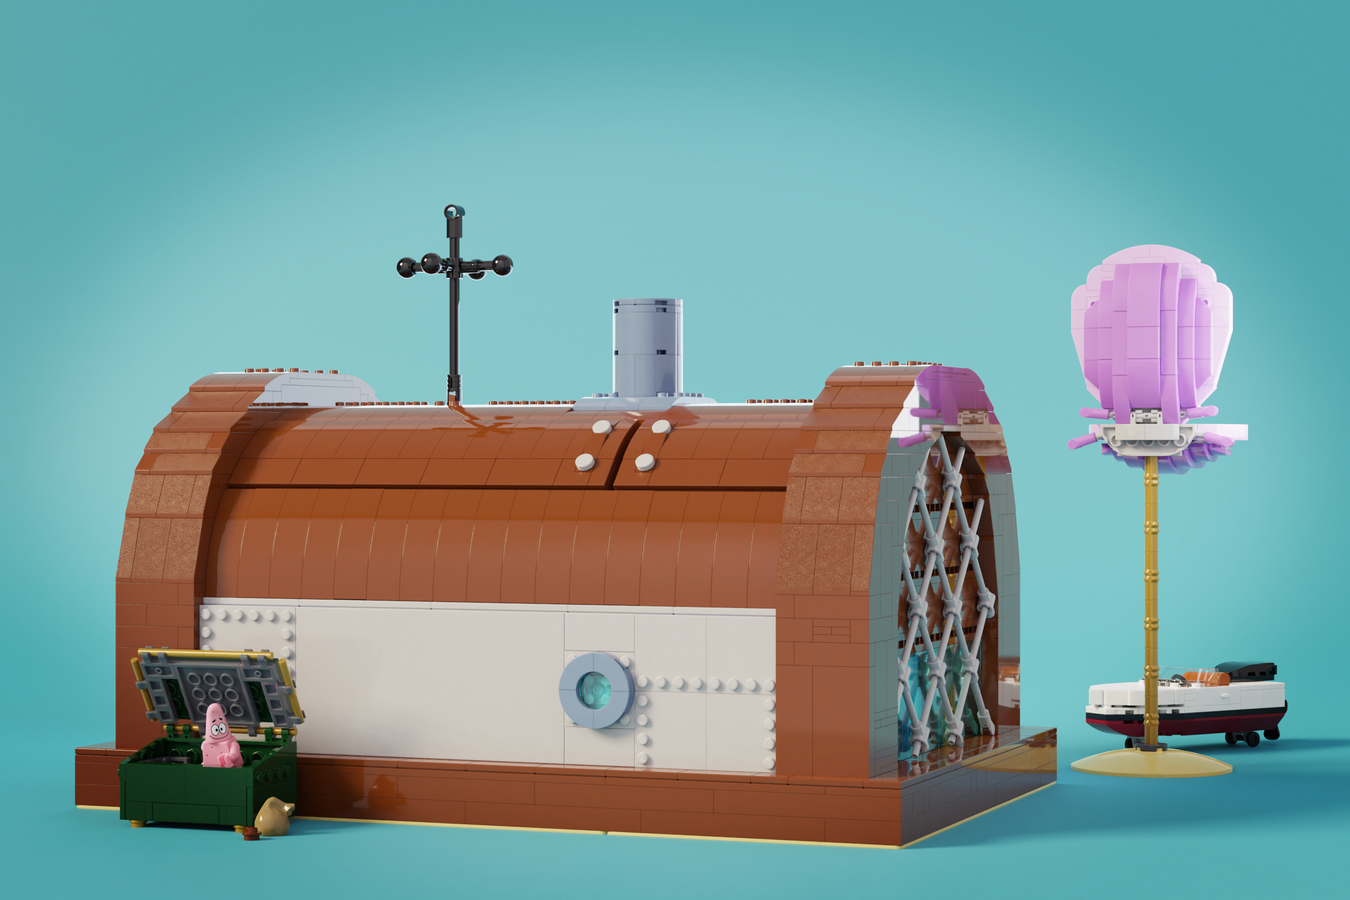 lego-ideas-spongebob-squarepants-the-krusty-krab-exe-sandbox-2 zusammengebaut.com